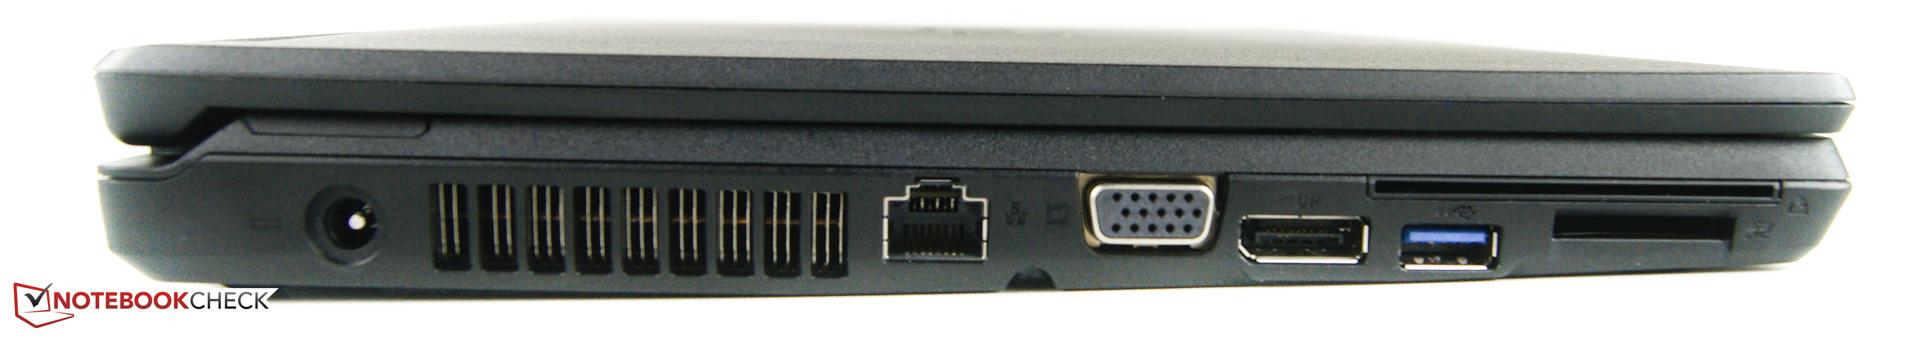 FUJITSU SIEMENS USB SMART CARD READER DRIVERS FOR WINDOWS 7